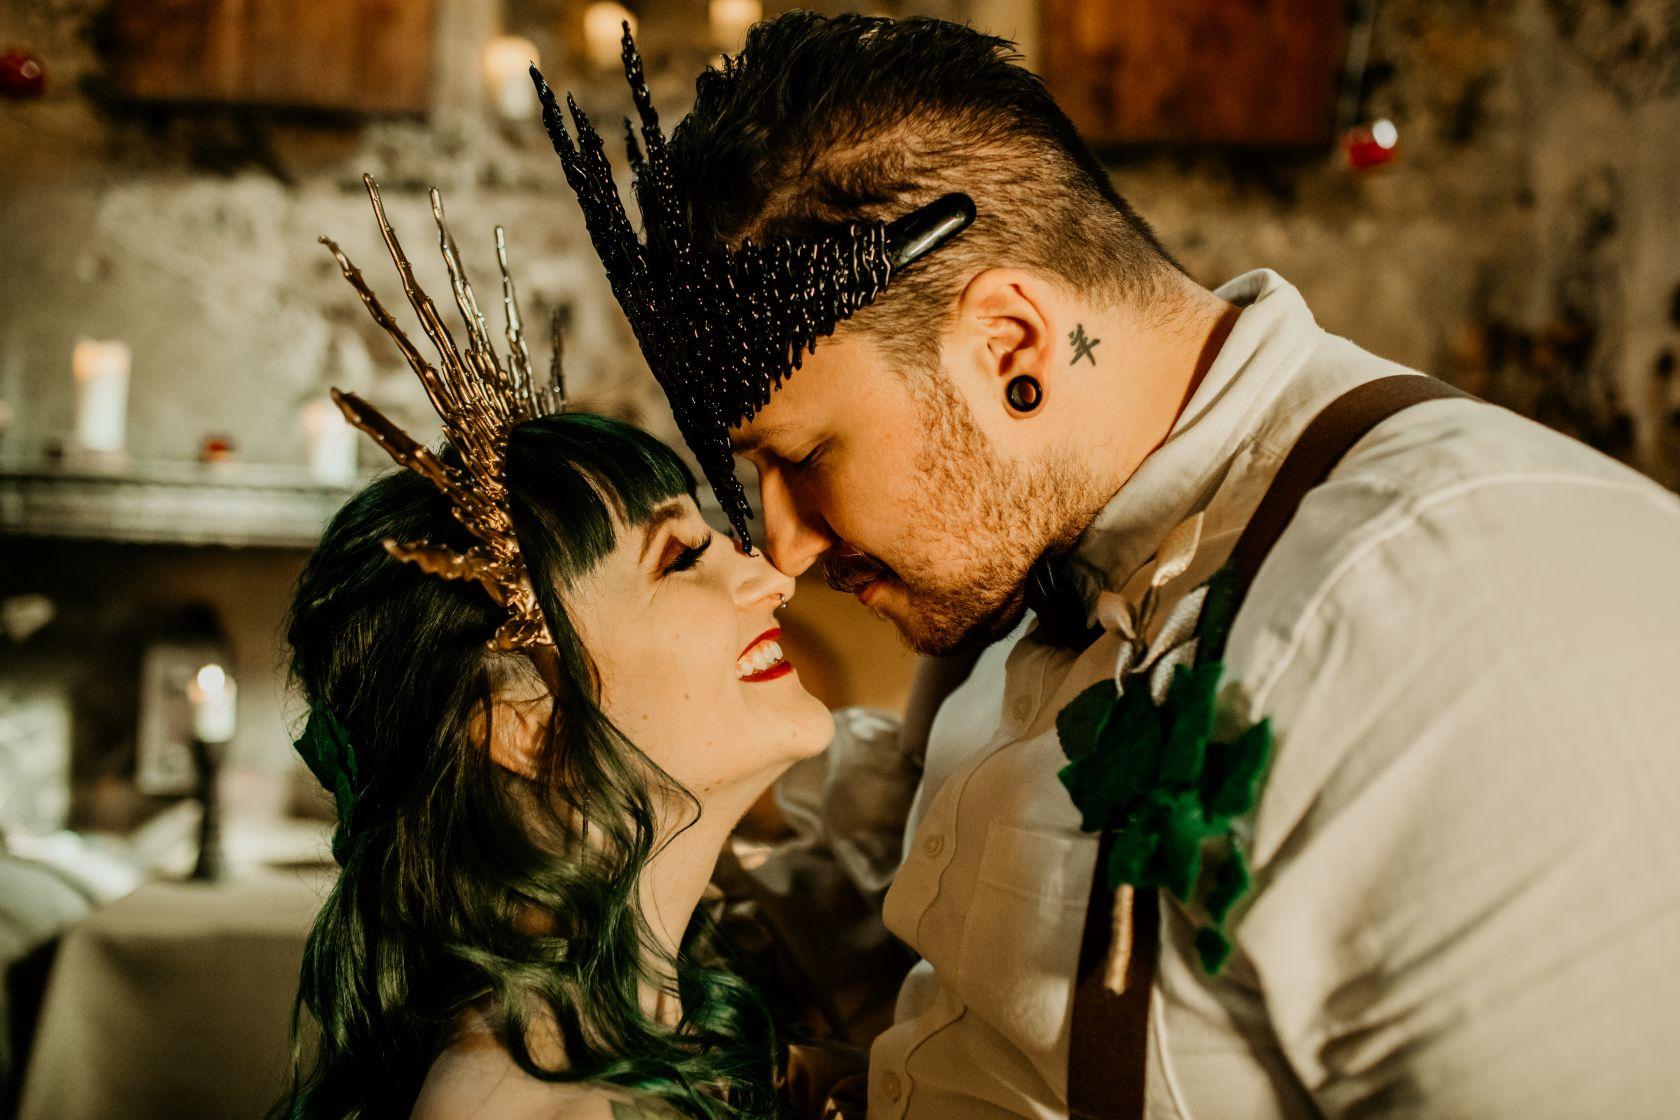 alternative fairytale wedding- snow white wedding- charlotte laurie designs-chloe mary photo- unconventional wedding- alternative wedding inspiration- alternative wedding headpiece